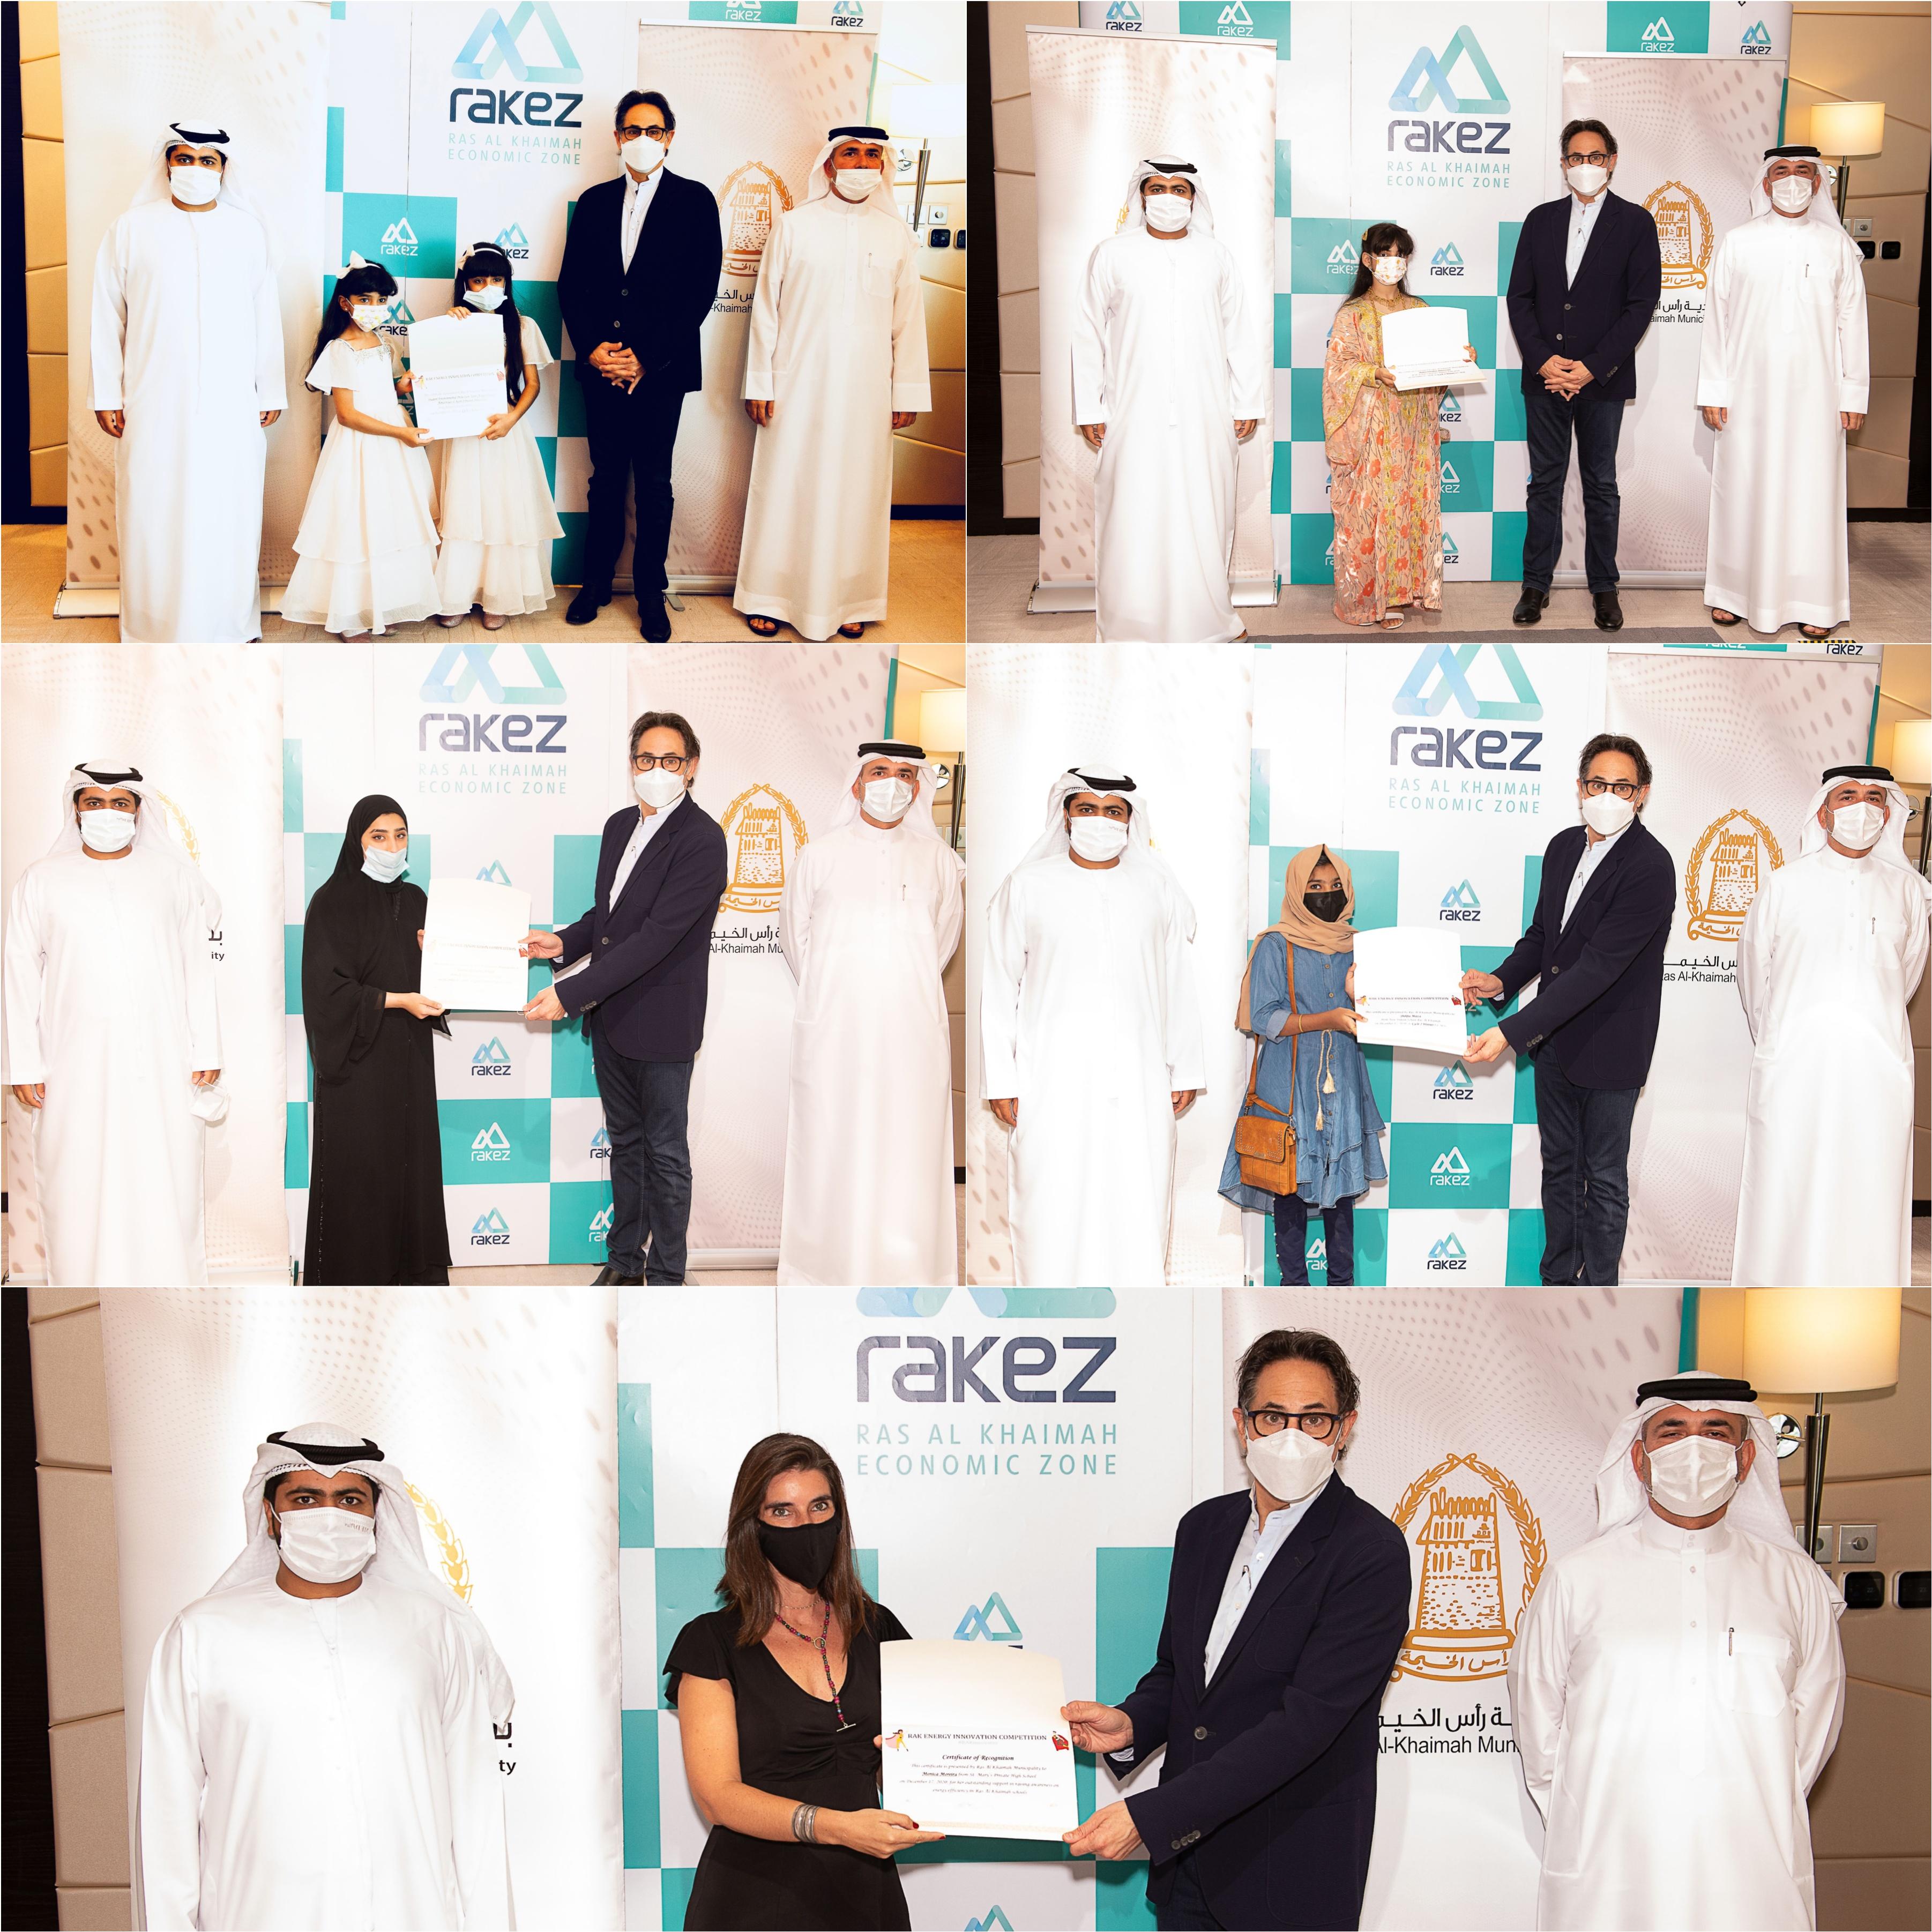 Ras Al Khaimah Municipality and Ras Al Khaimah Economic Zone (RAKEZ) awarded the winners of RAK Energy Innovation Competition (School Edition).